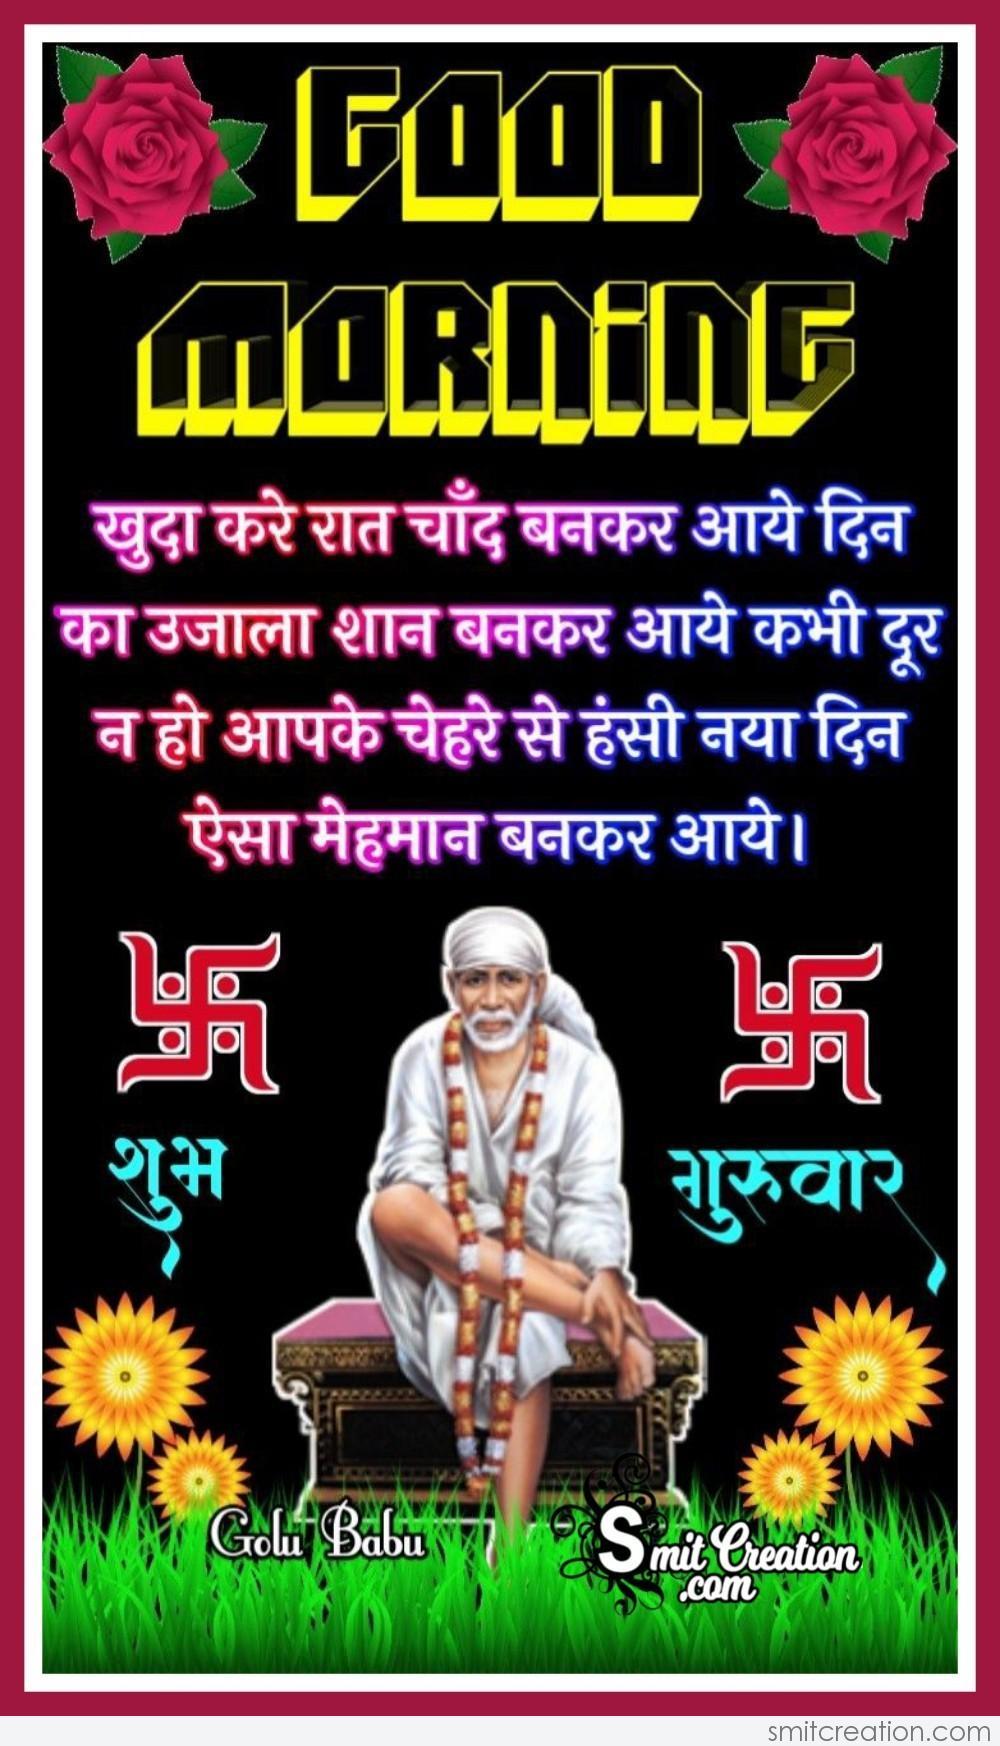 Good Morning Shubh Guruvar - SmitCreation.com